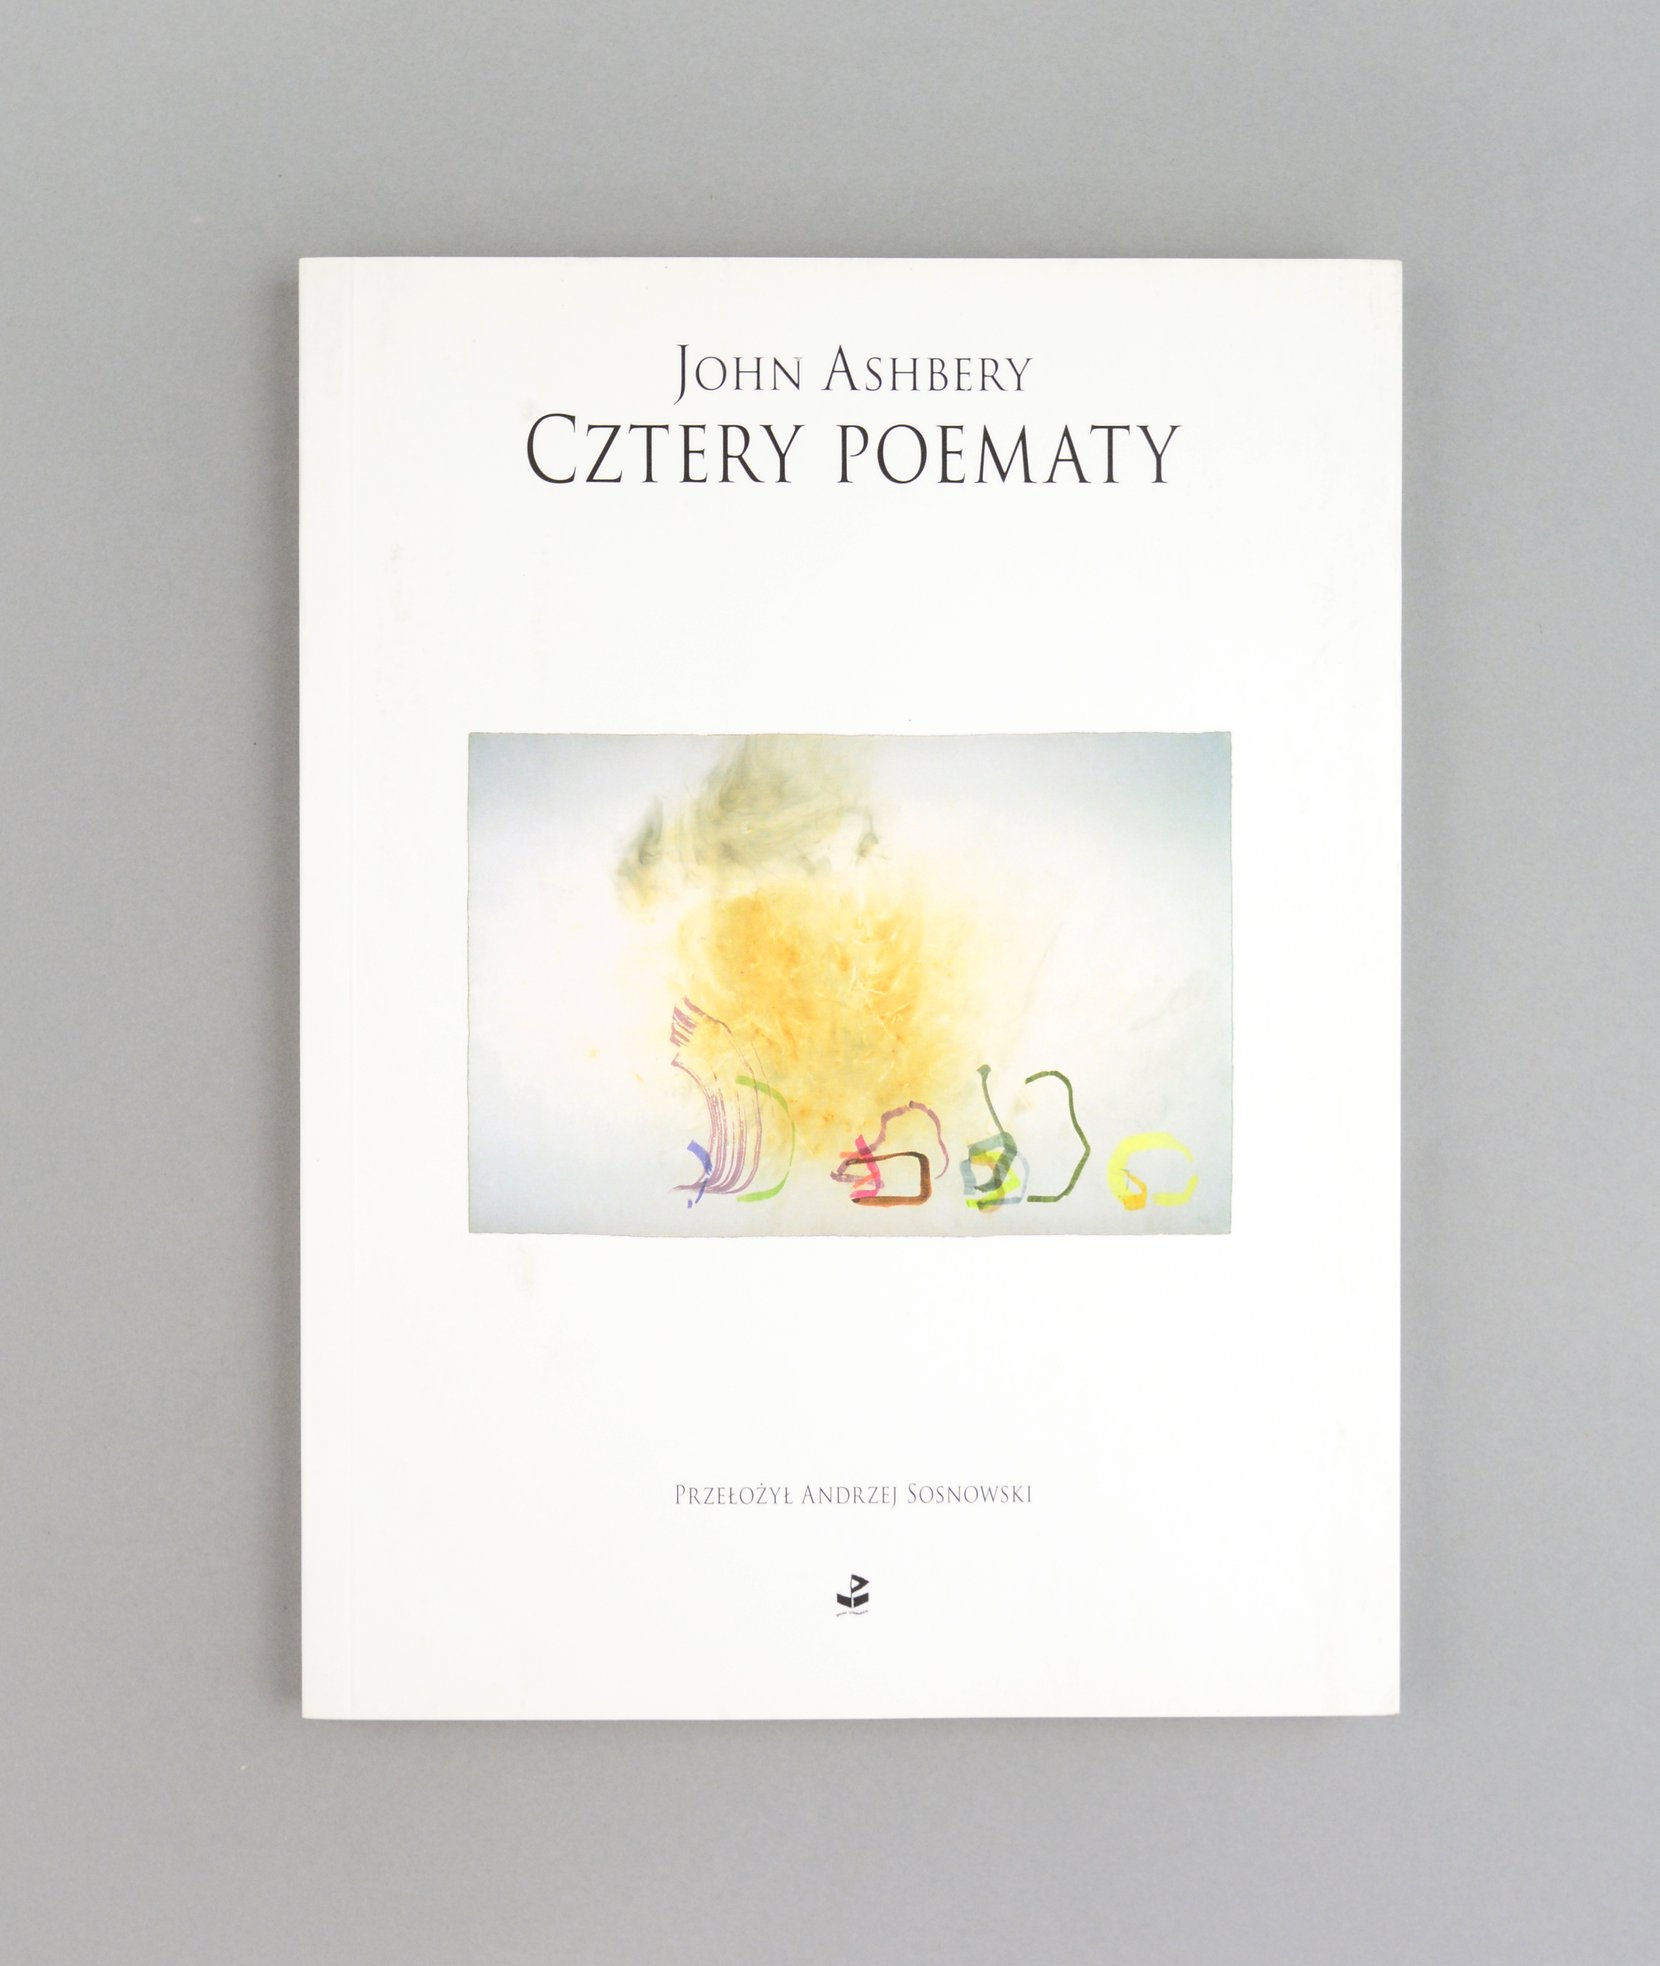 john ashbery: cztery poematy, 2012. books poetry John Ashbery